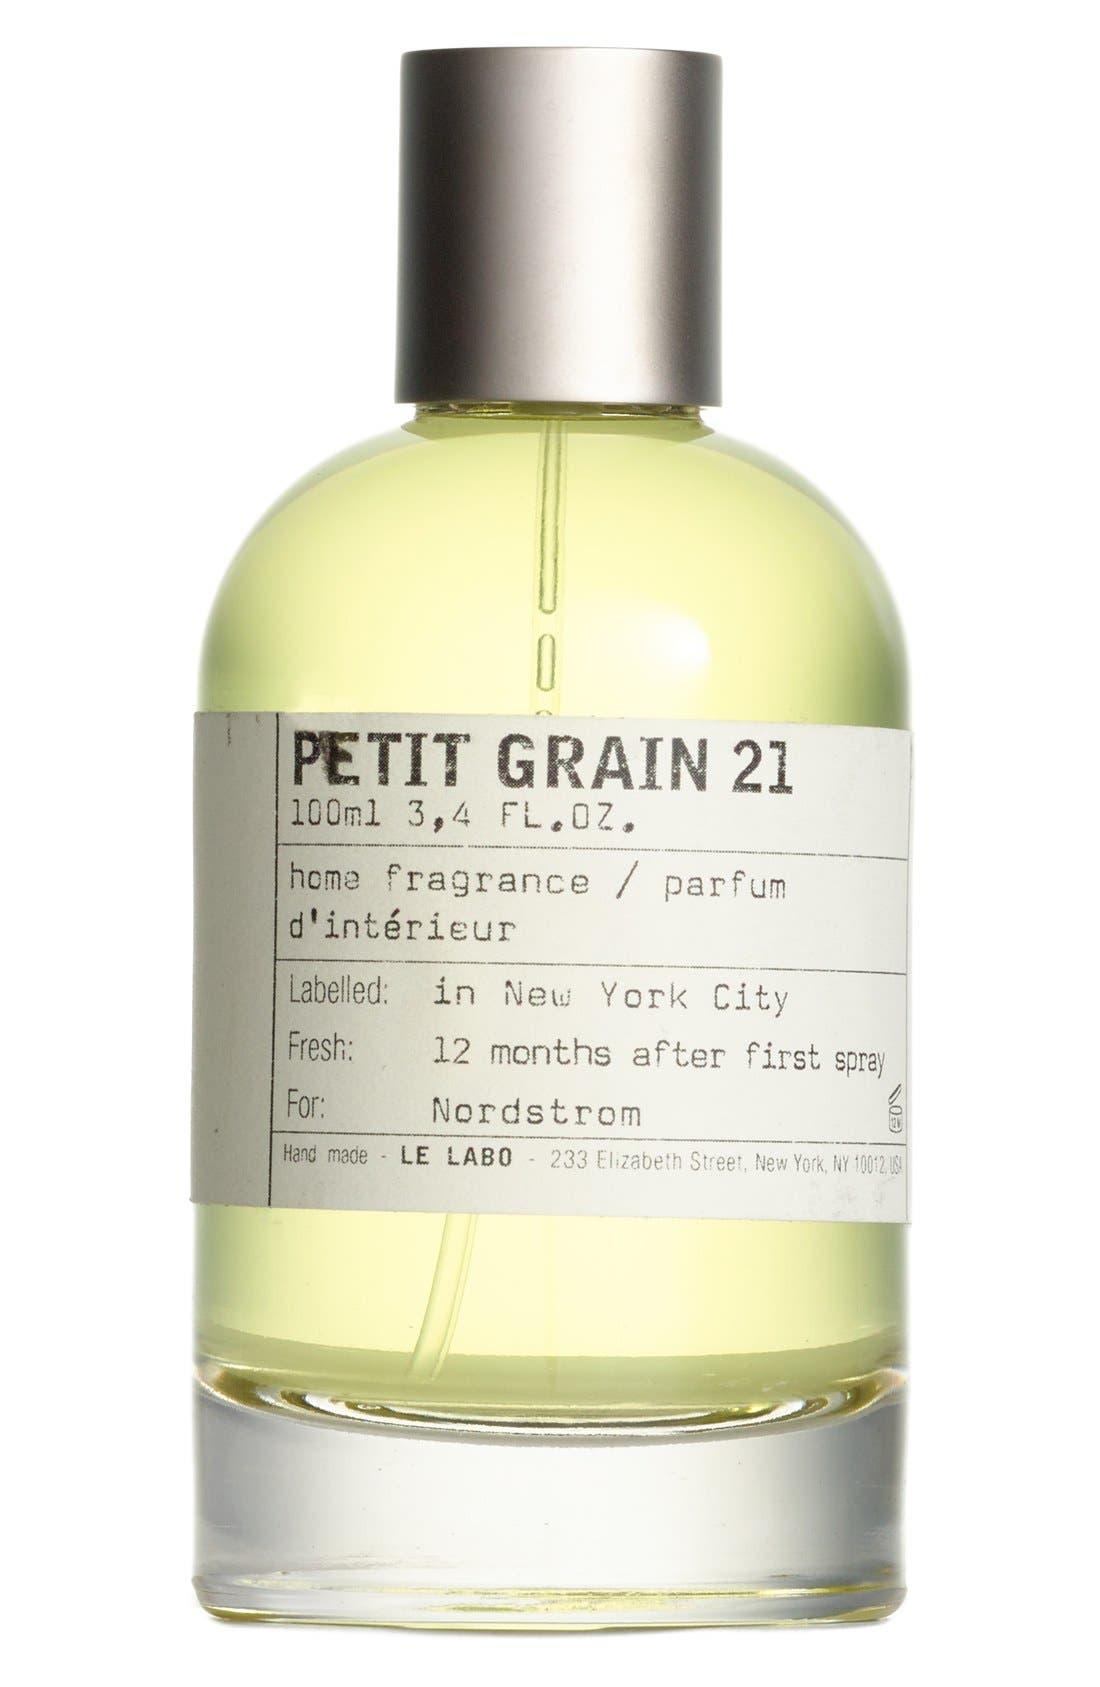 Le Labo 'Petit Grain 21' Home Fragrance Spray